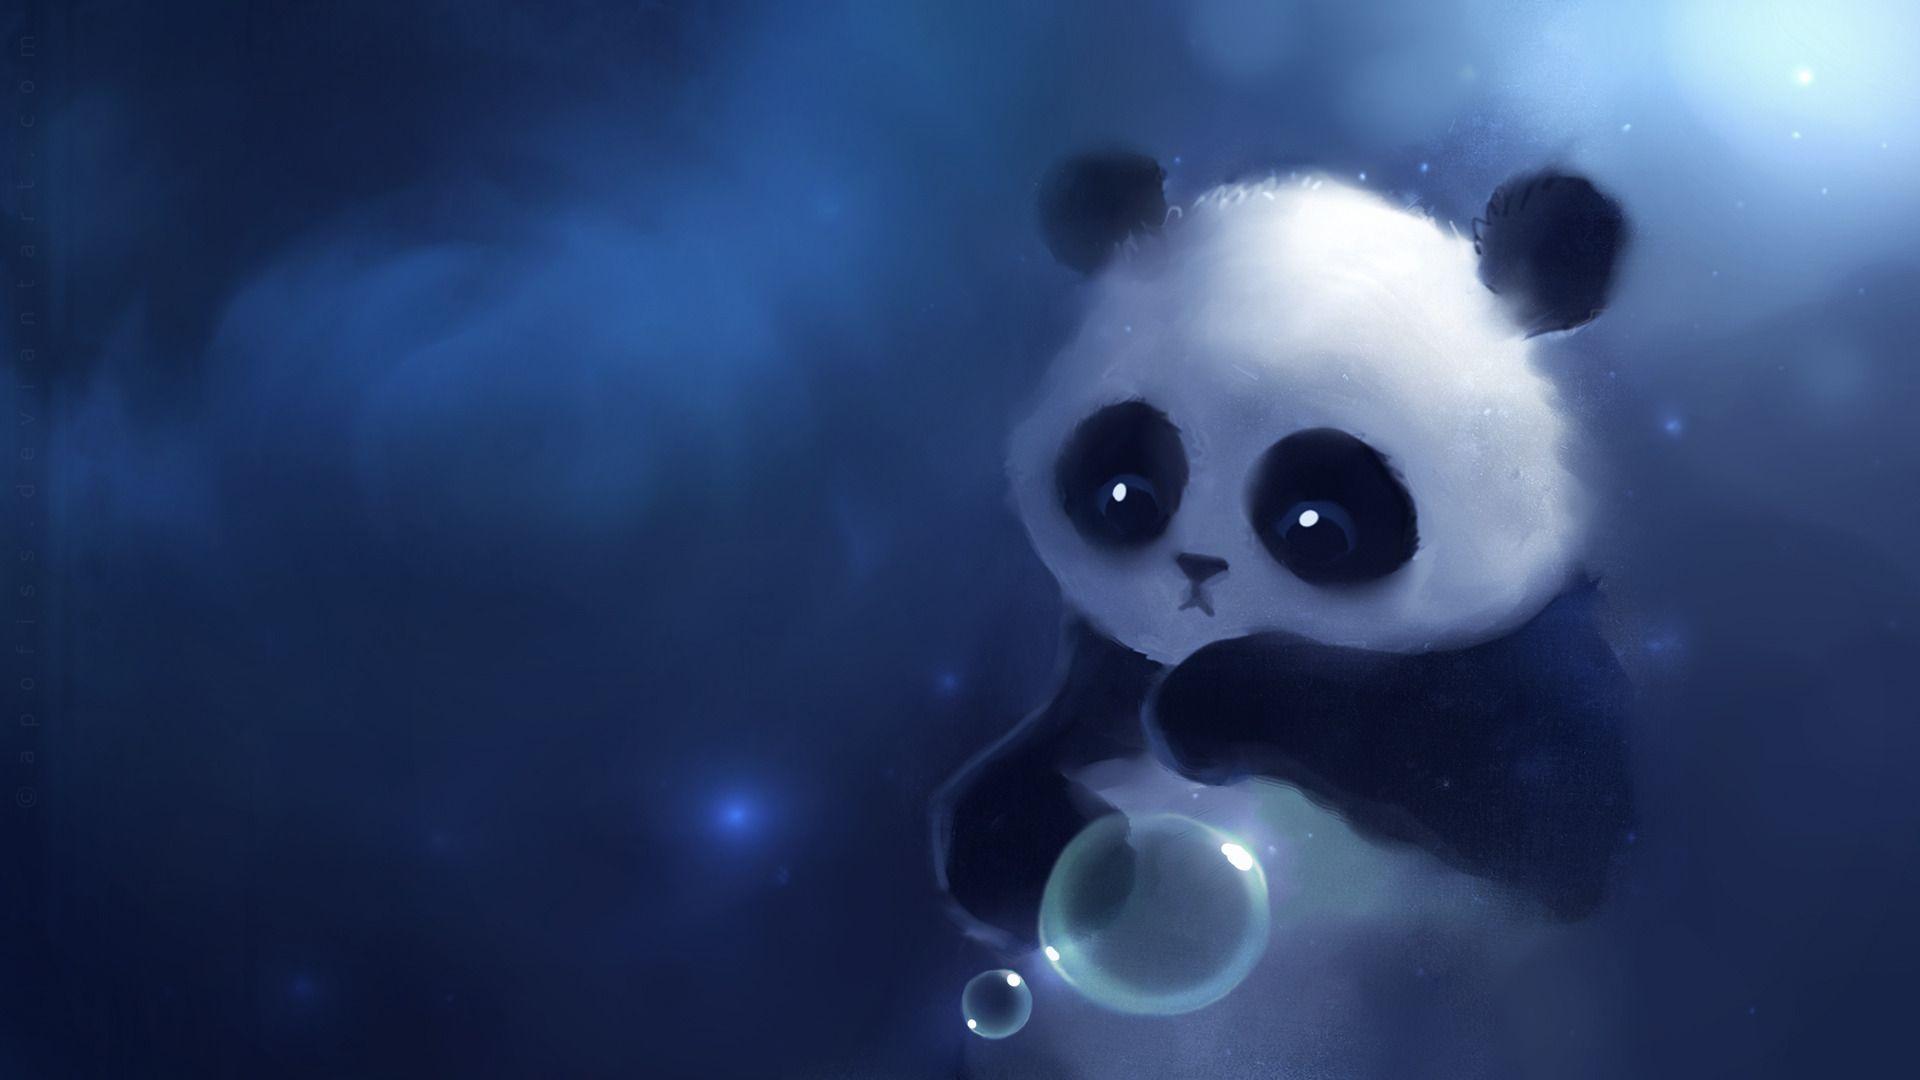 Cute Panda Desktop Wallpapers Top Free Cute Panda Desktop